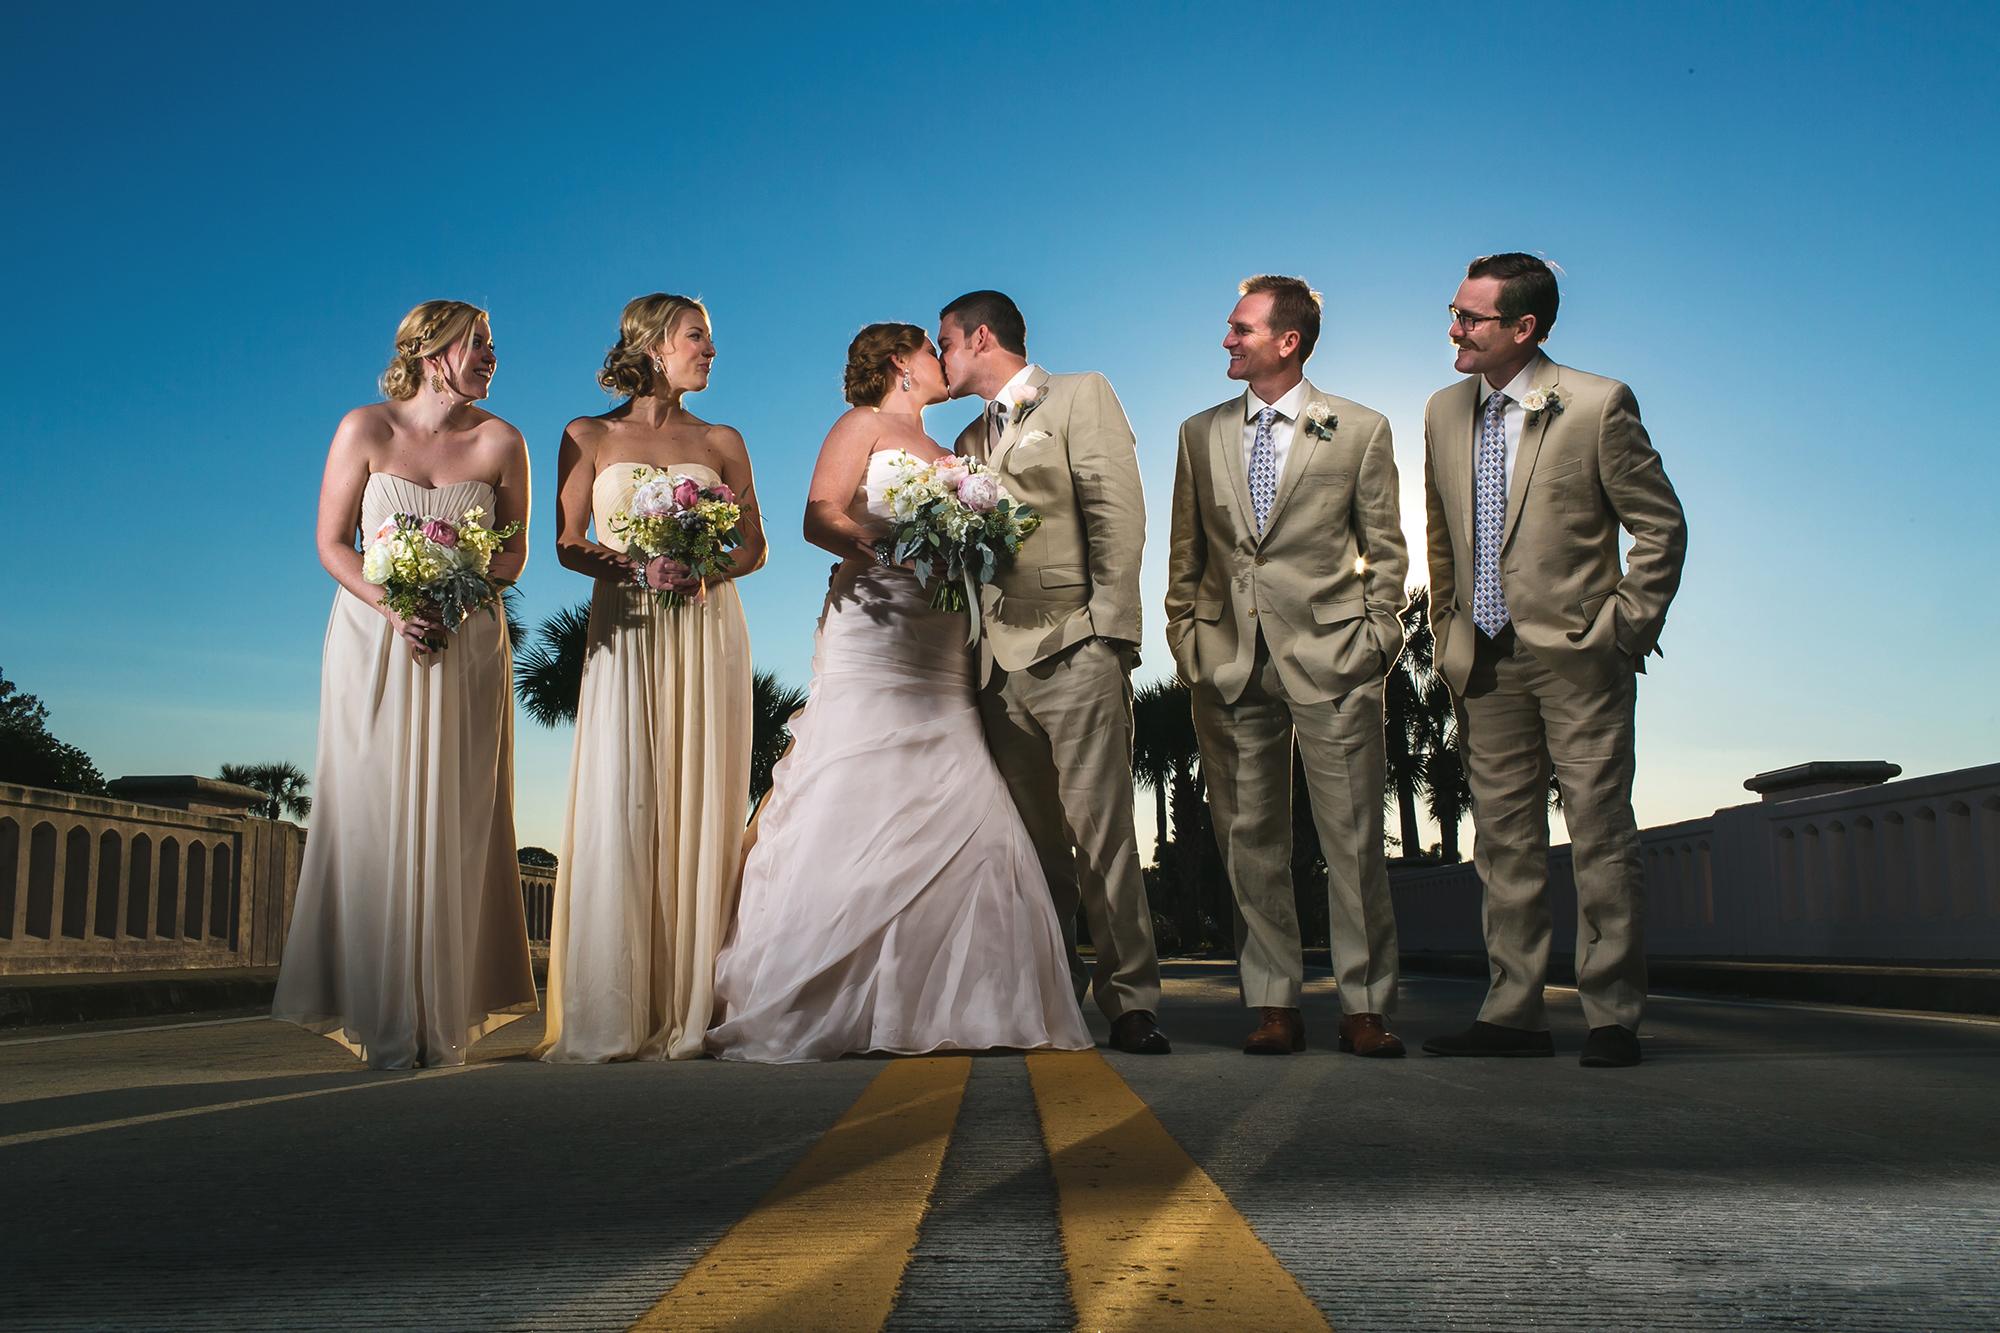 adam-szarmack-wedding-wedding-party-streets.jpg